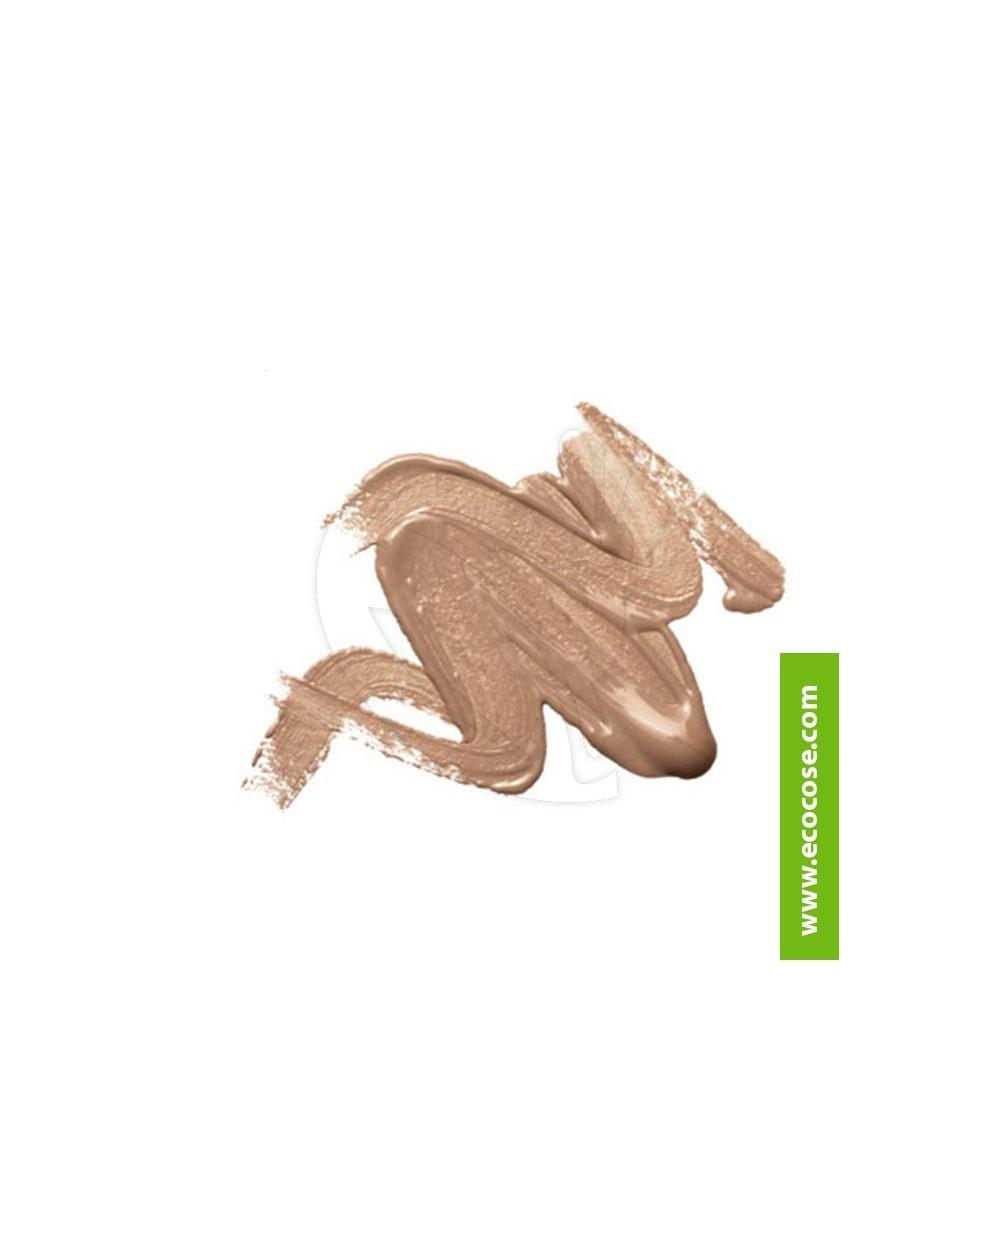 Couleur Caramel - Fondotinta fluido Hydracoton - Pétale de ros 15